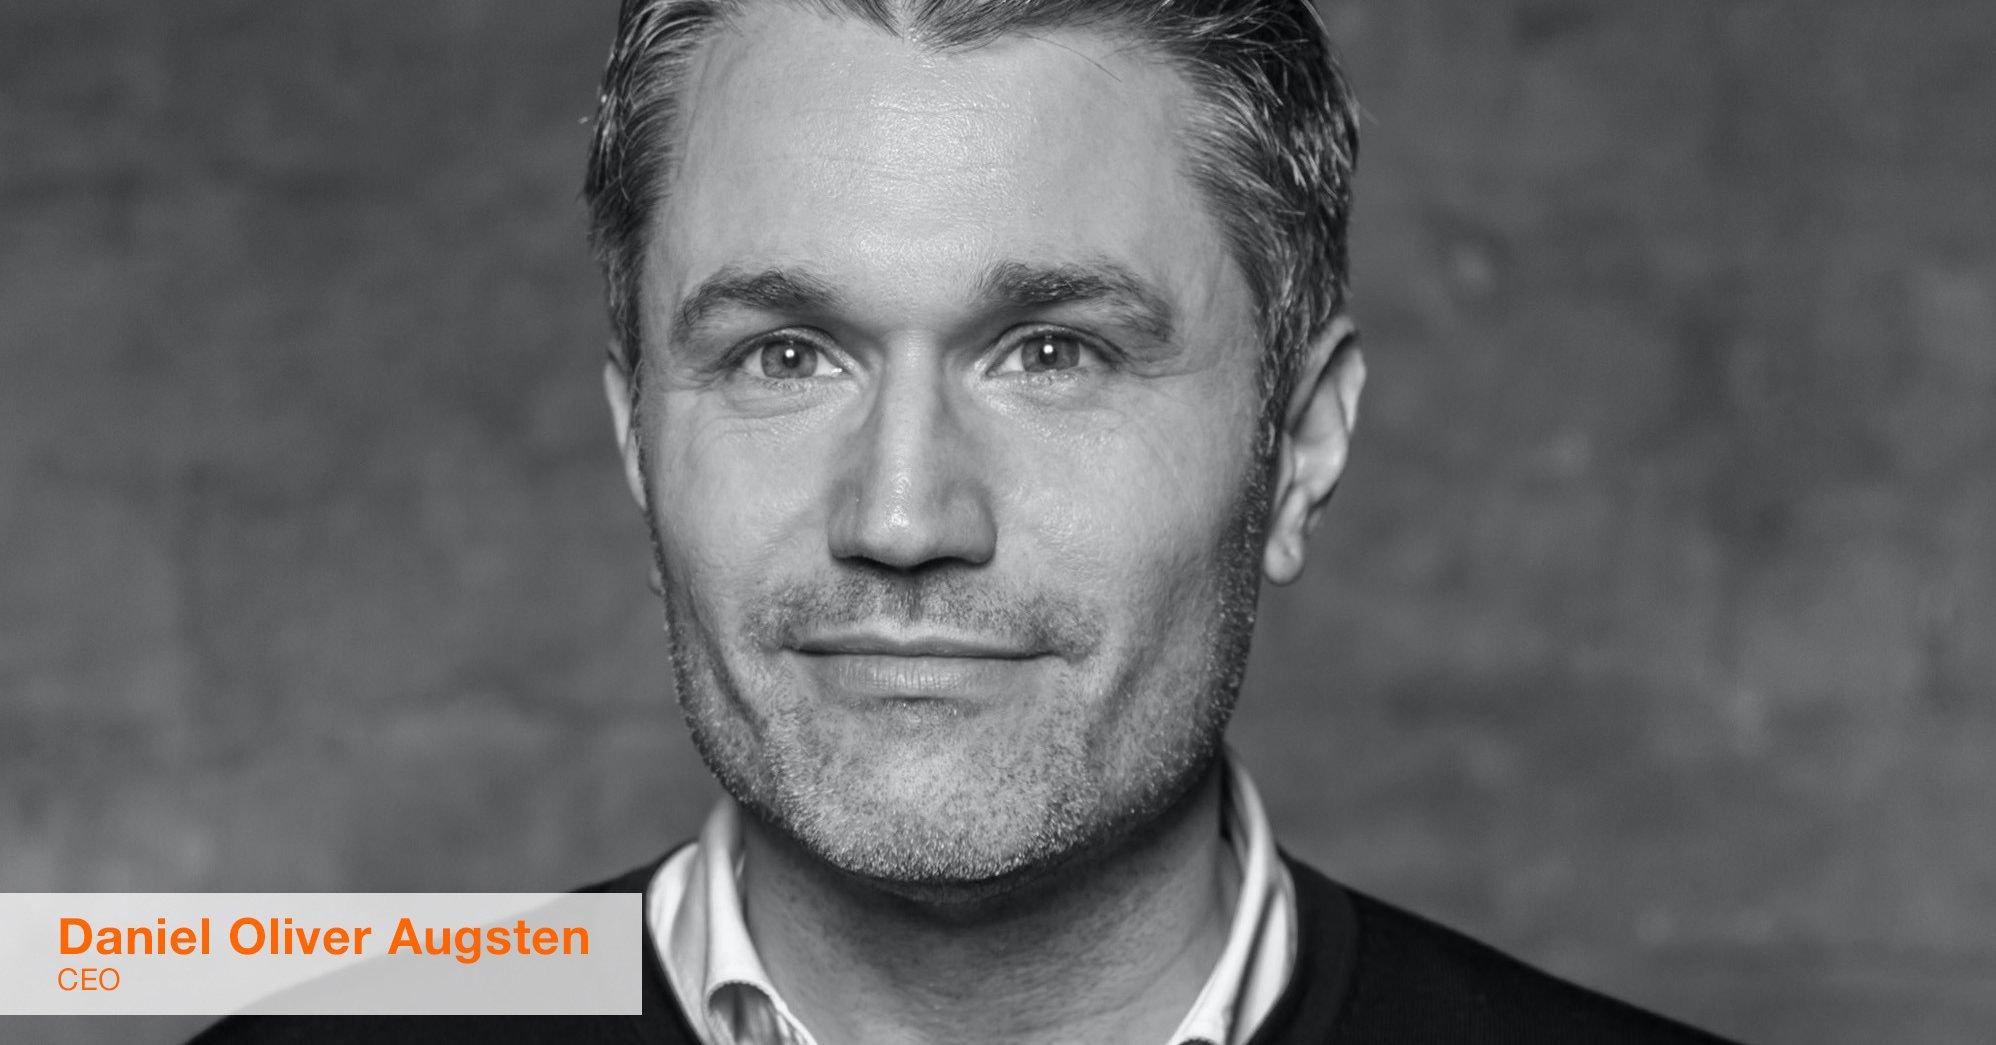 csm_Daniel_Oliver_Augsten_CEO